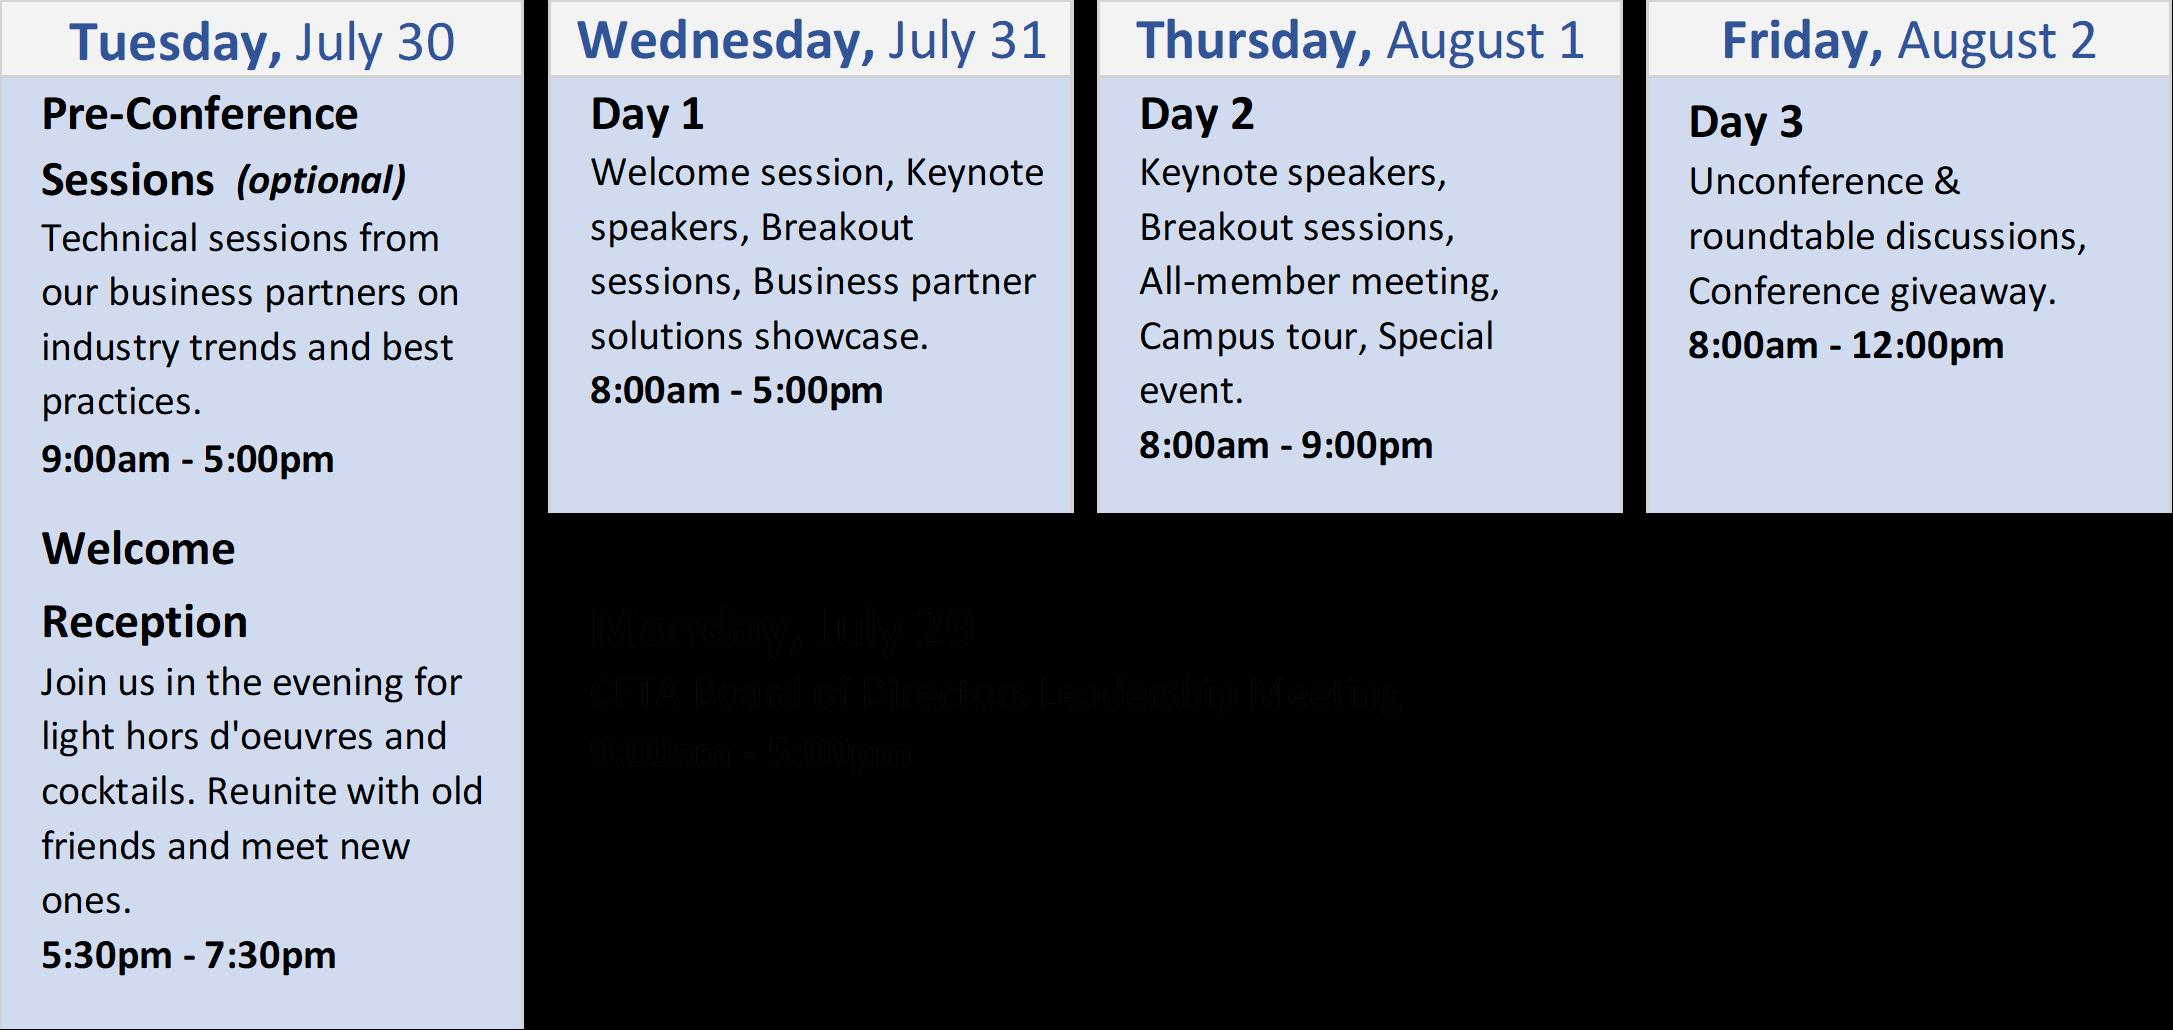 CFTA - 2019 Conference General Information